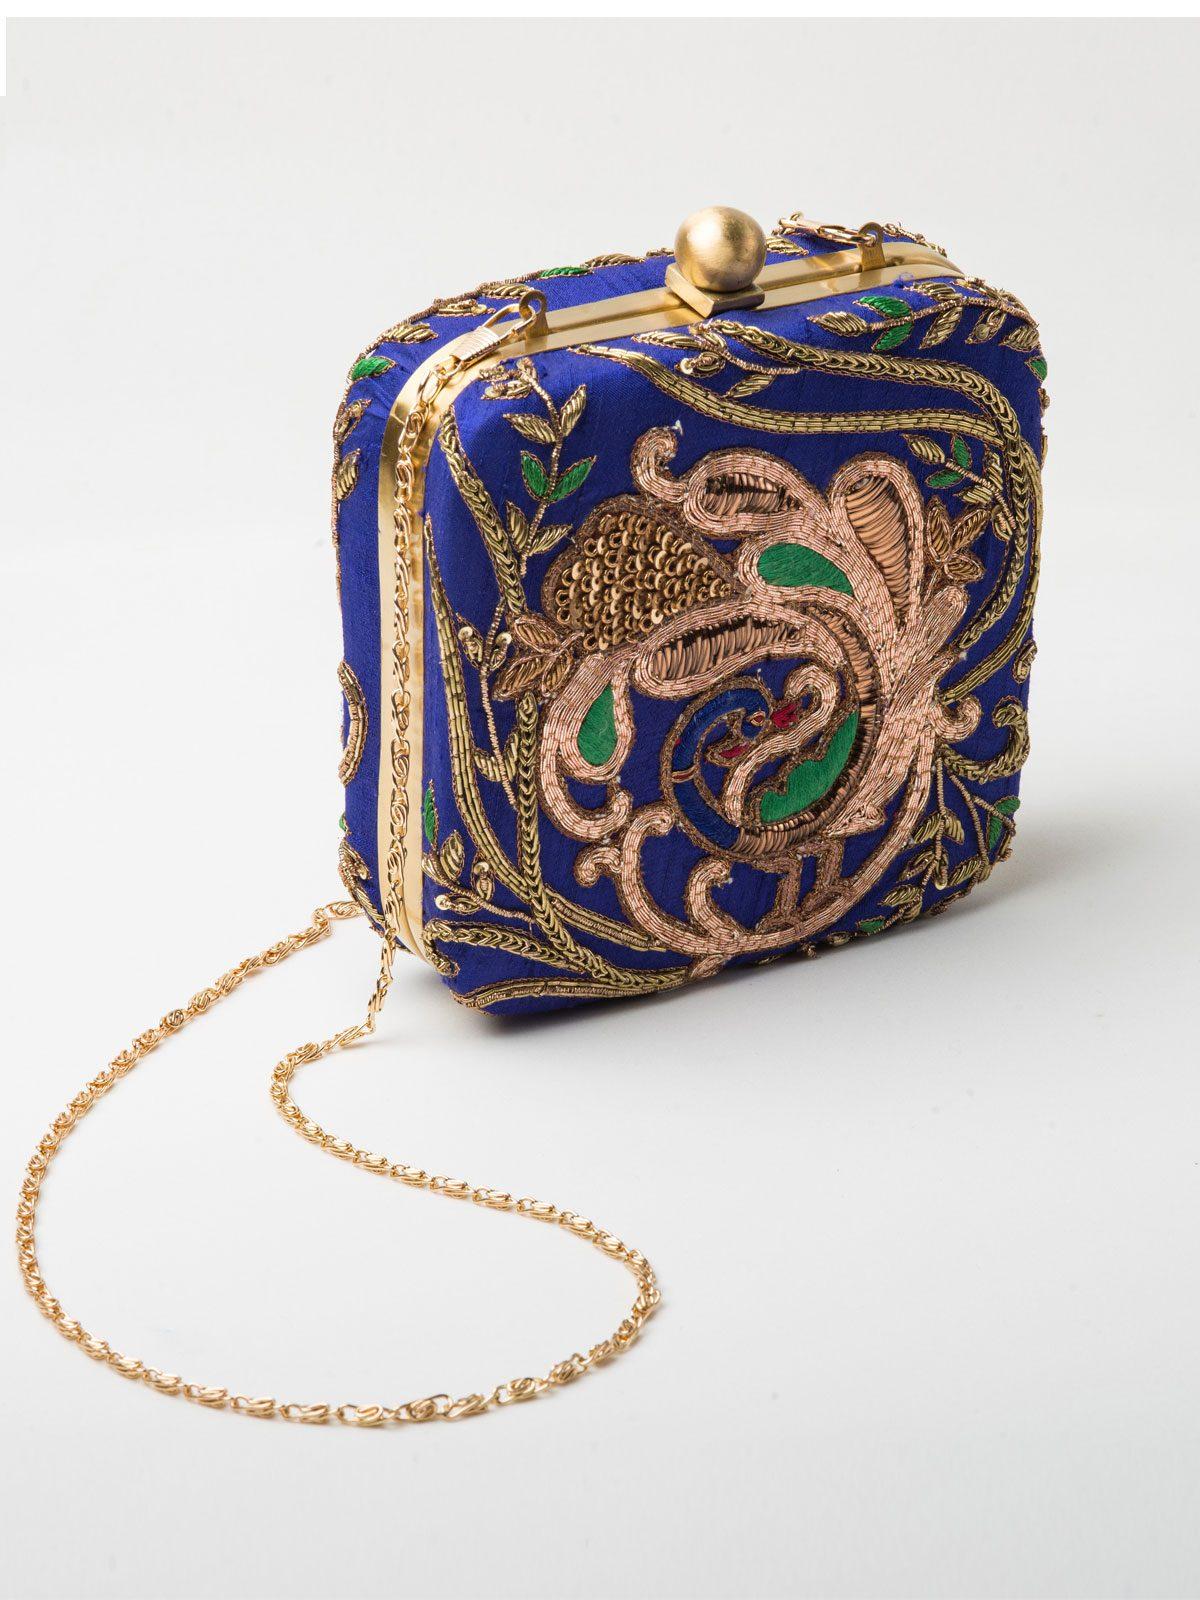 Bridal clutches, Jivaana, navy blue clutch